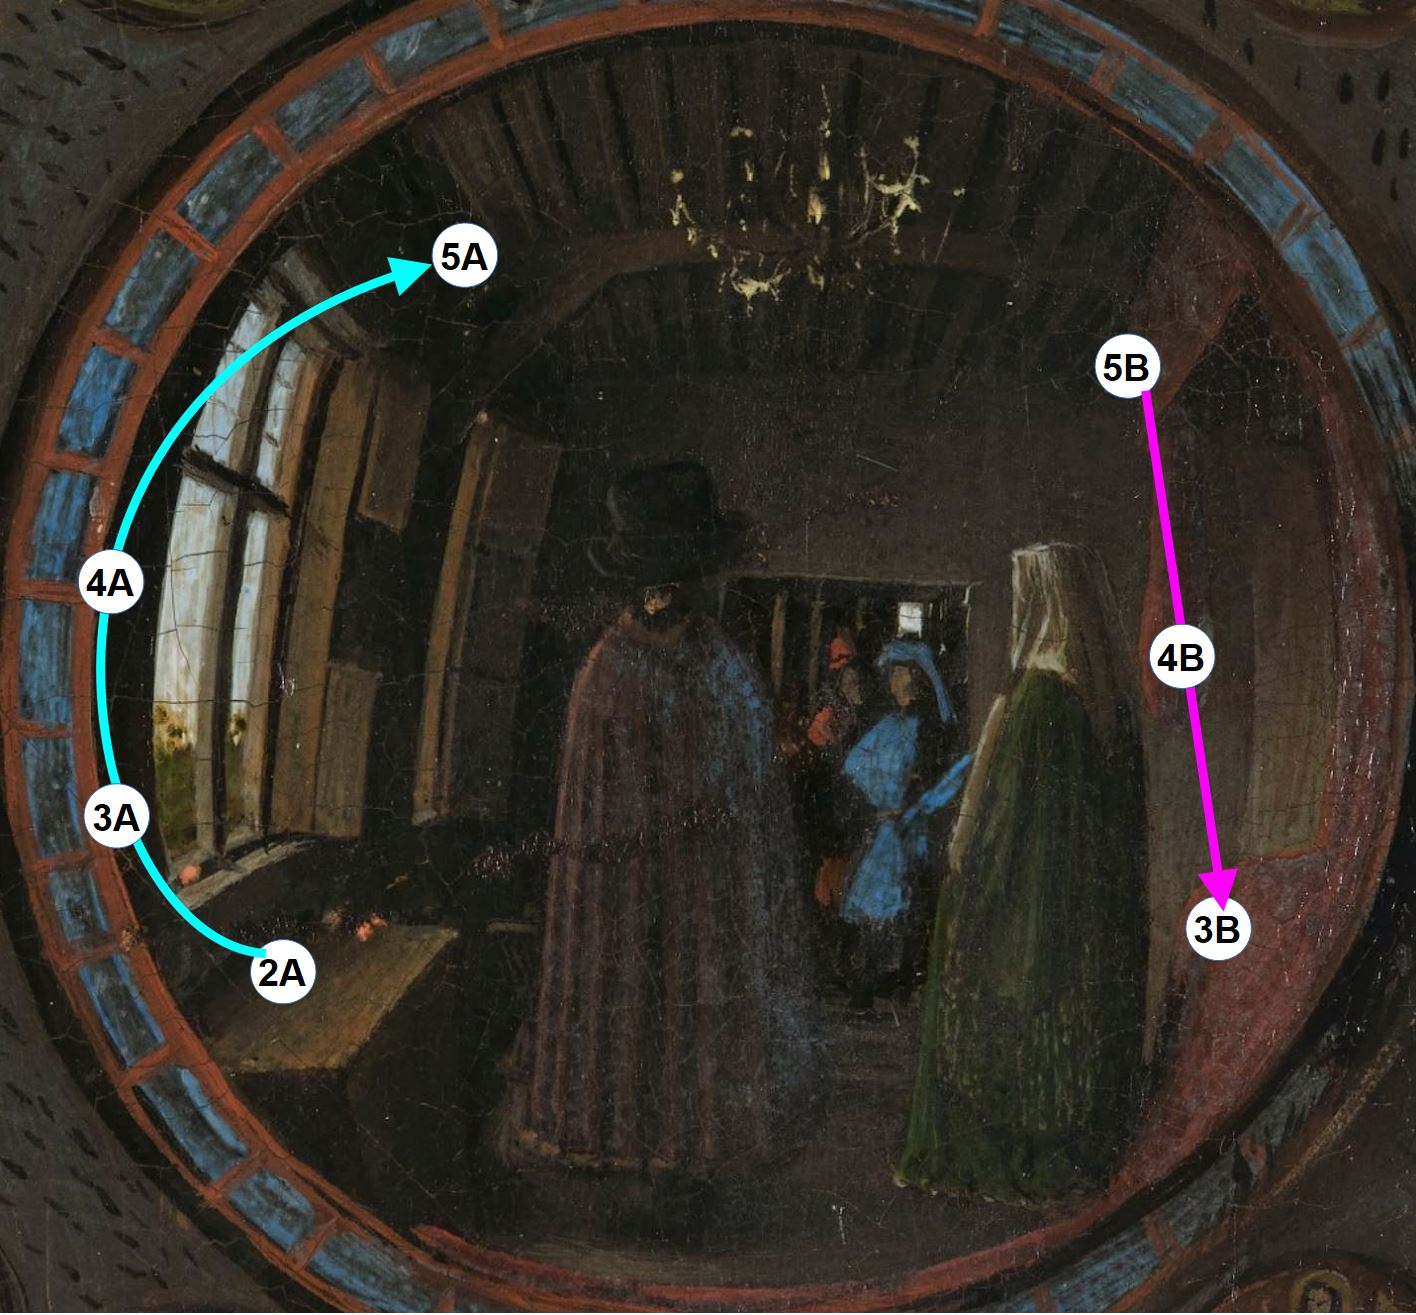 Van_Eyck 1434 _Arnolfini_Portrait schema tissus fruit miroir